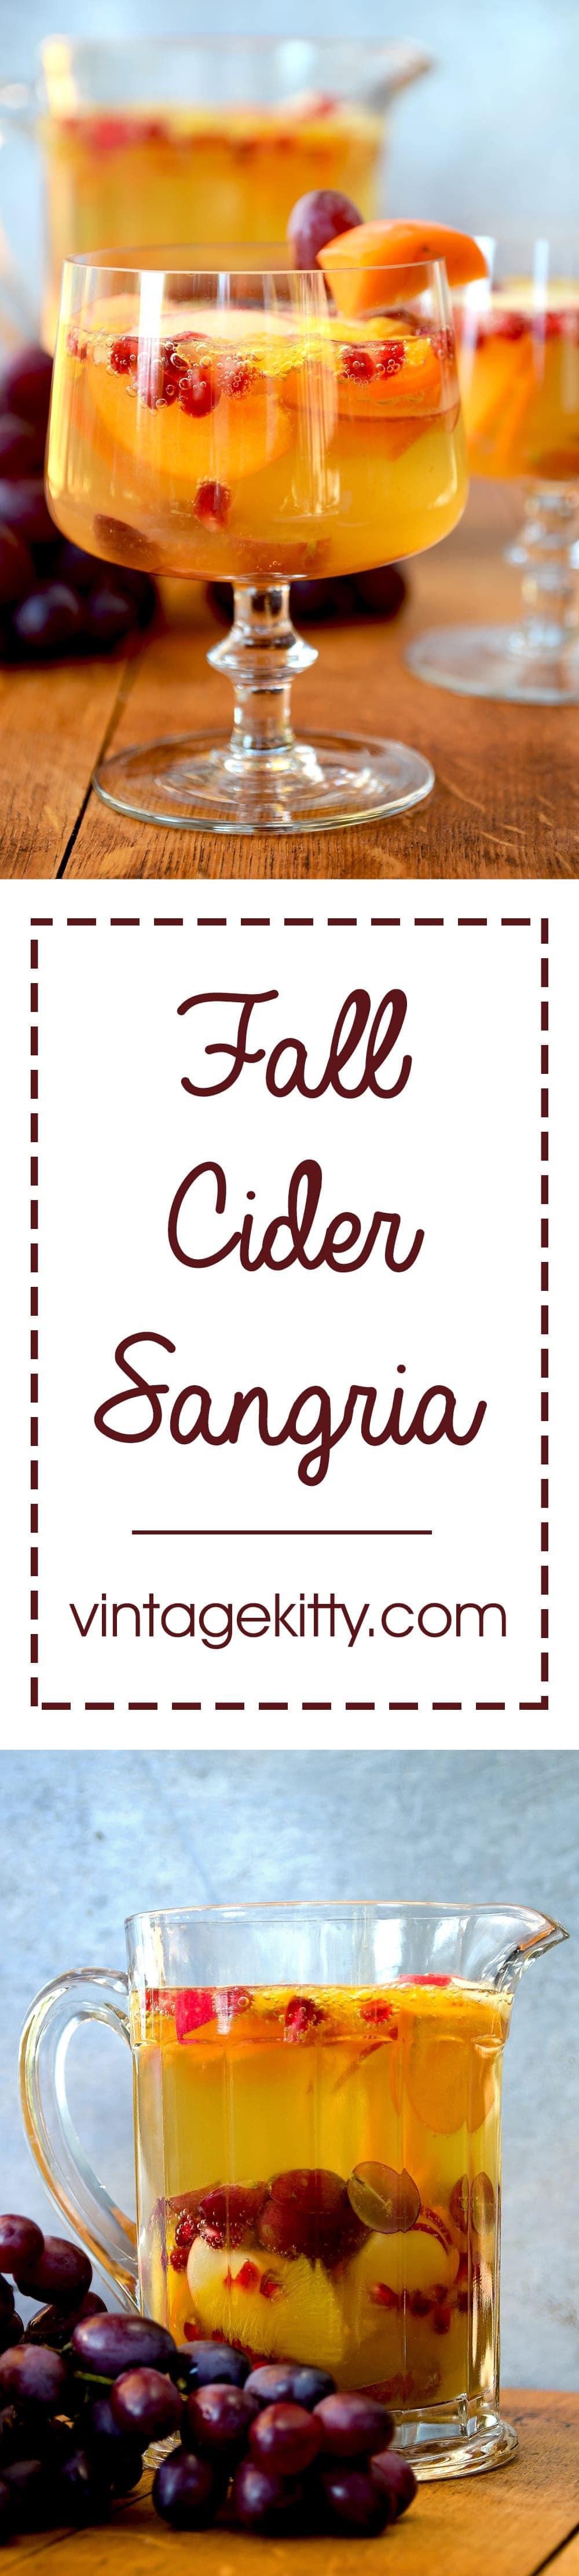 Cider Sangria Pin - Fall Cider Sangria